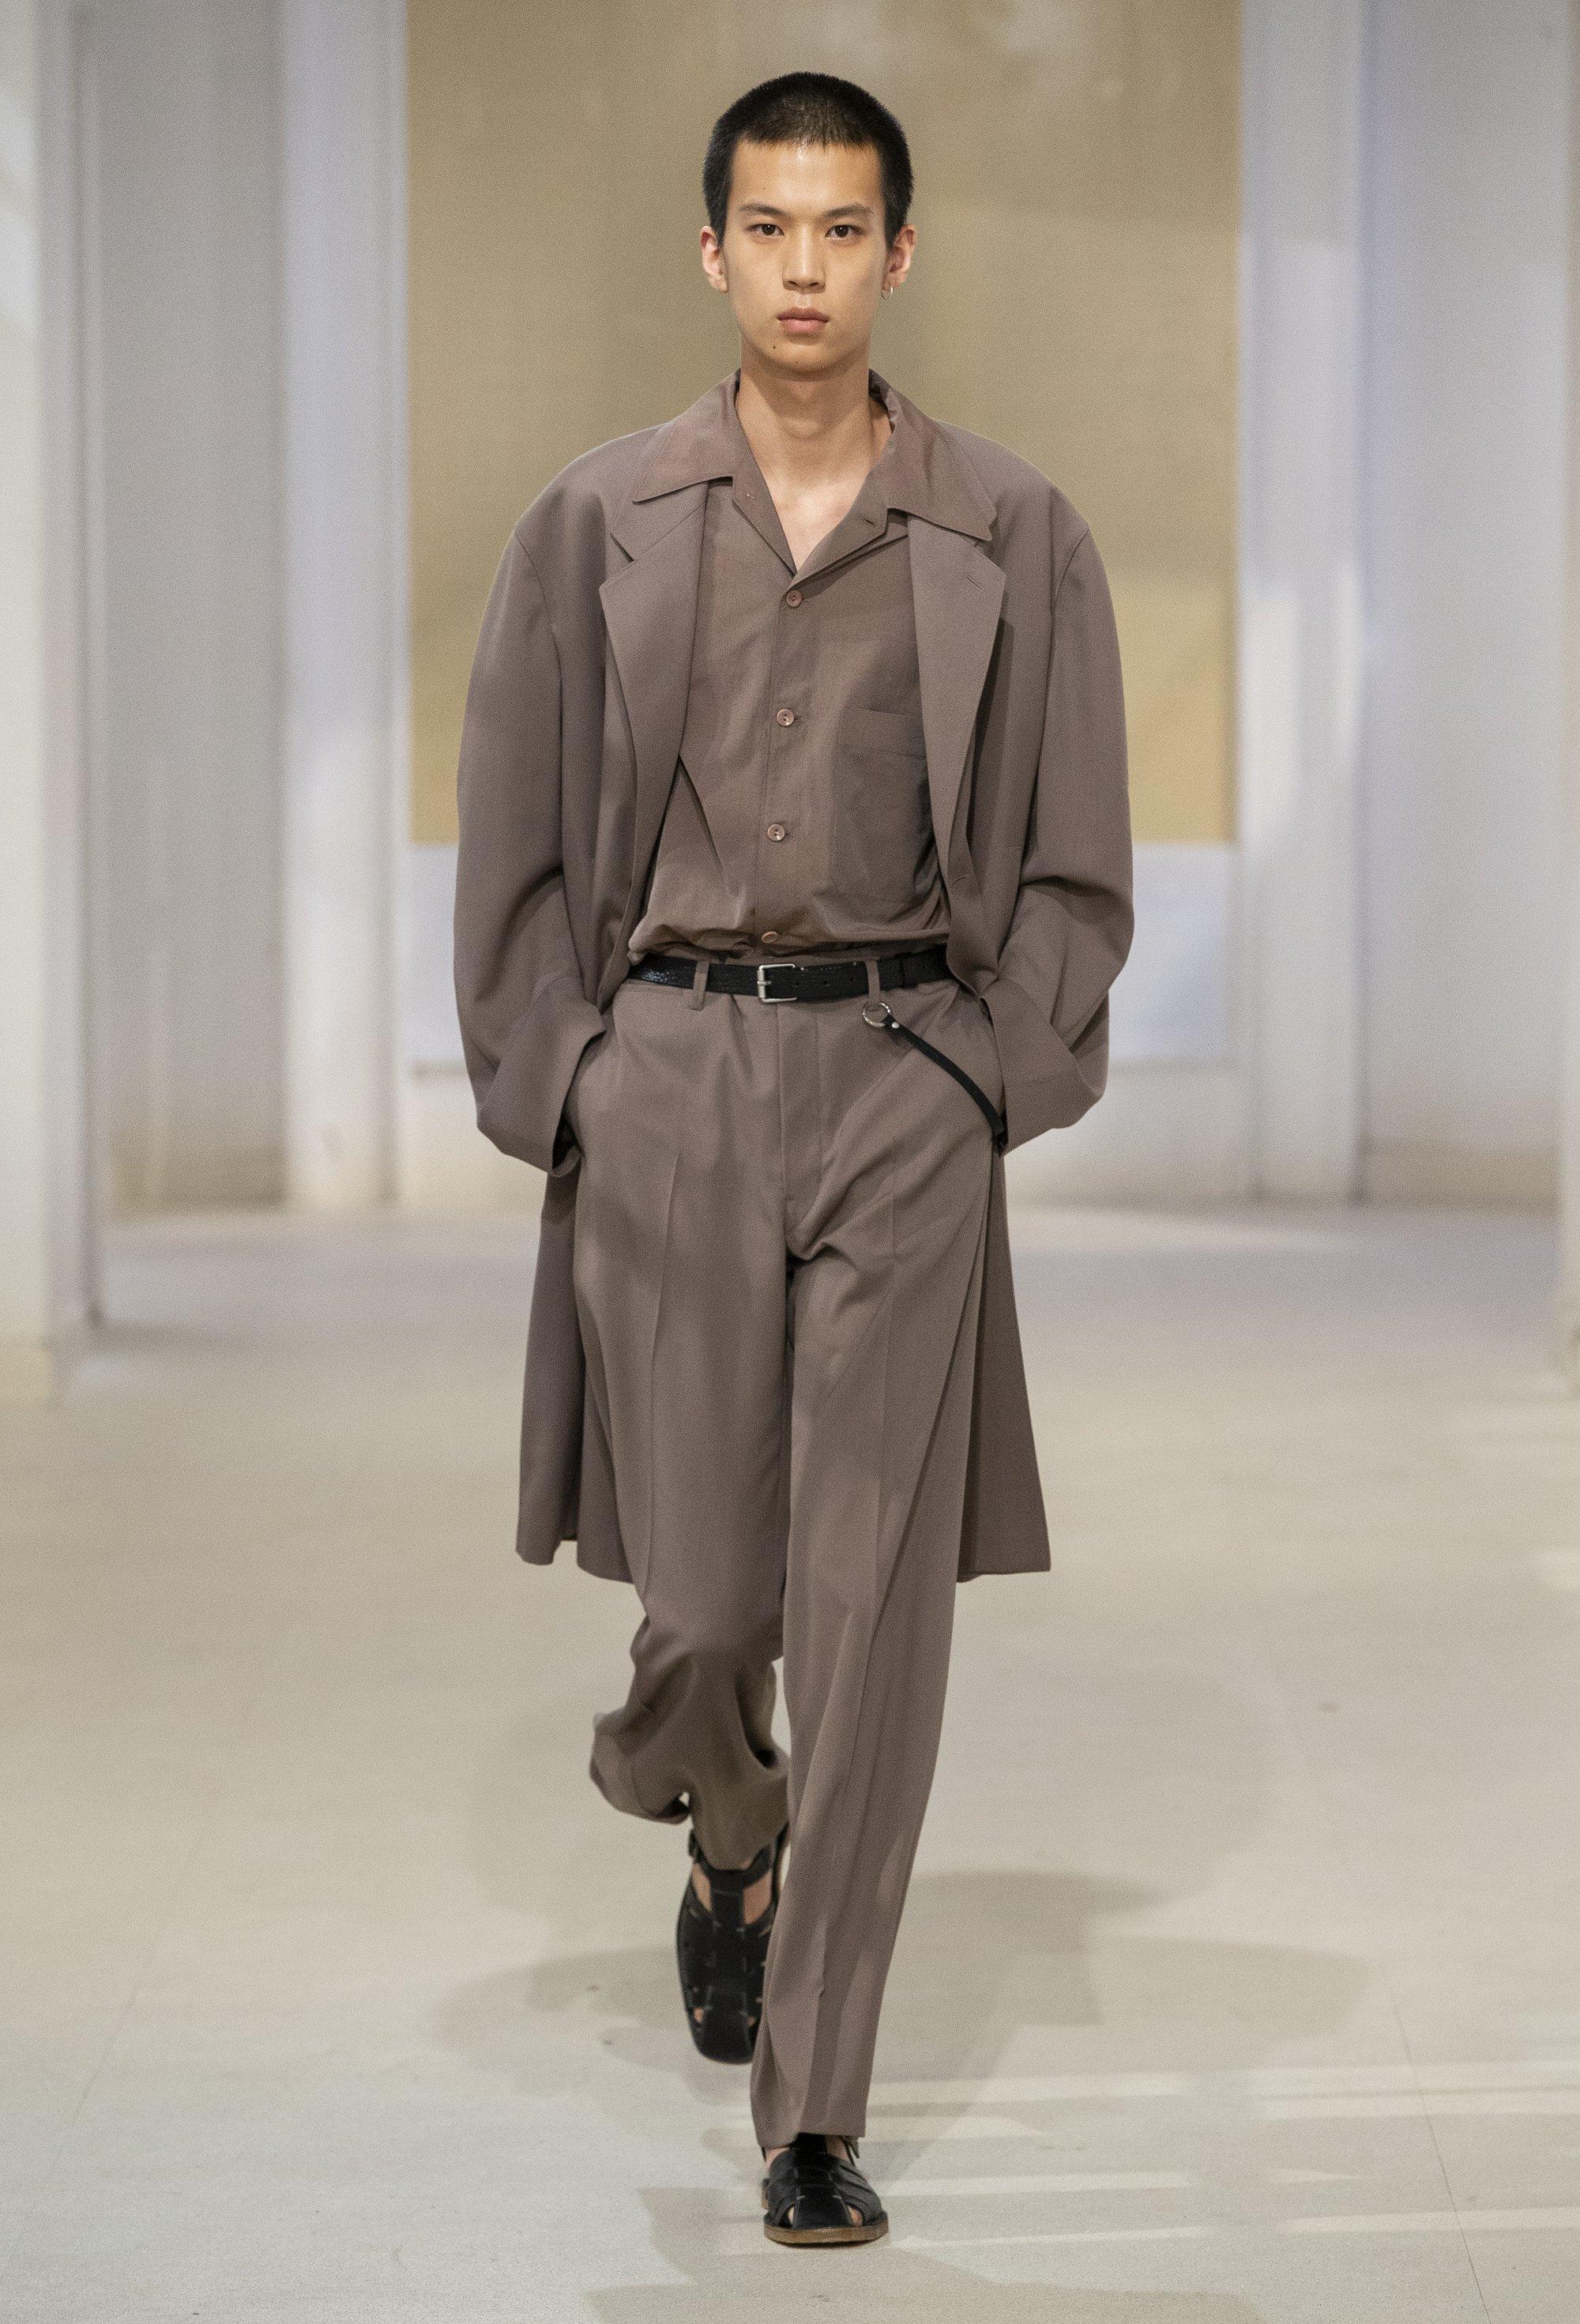 trang phuc linen - elle man style calendar - lemaire